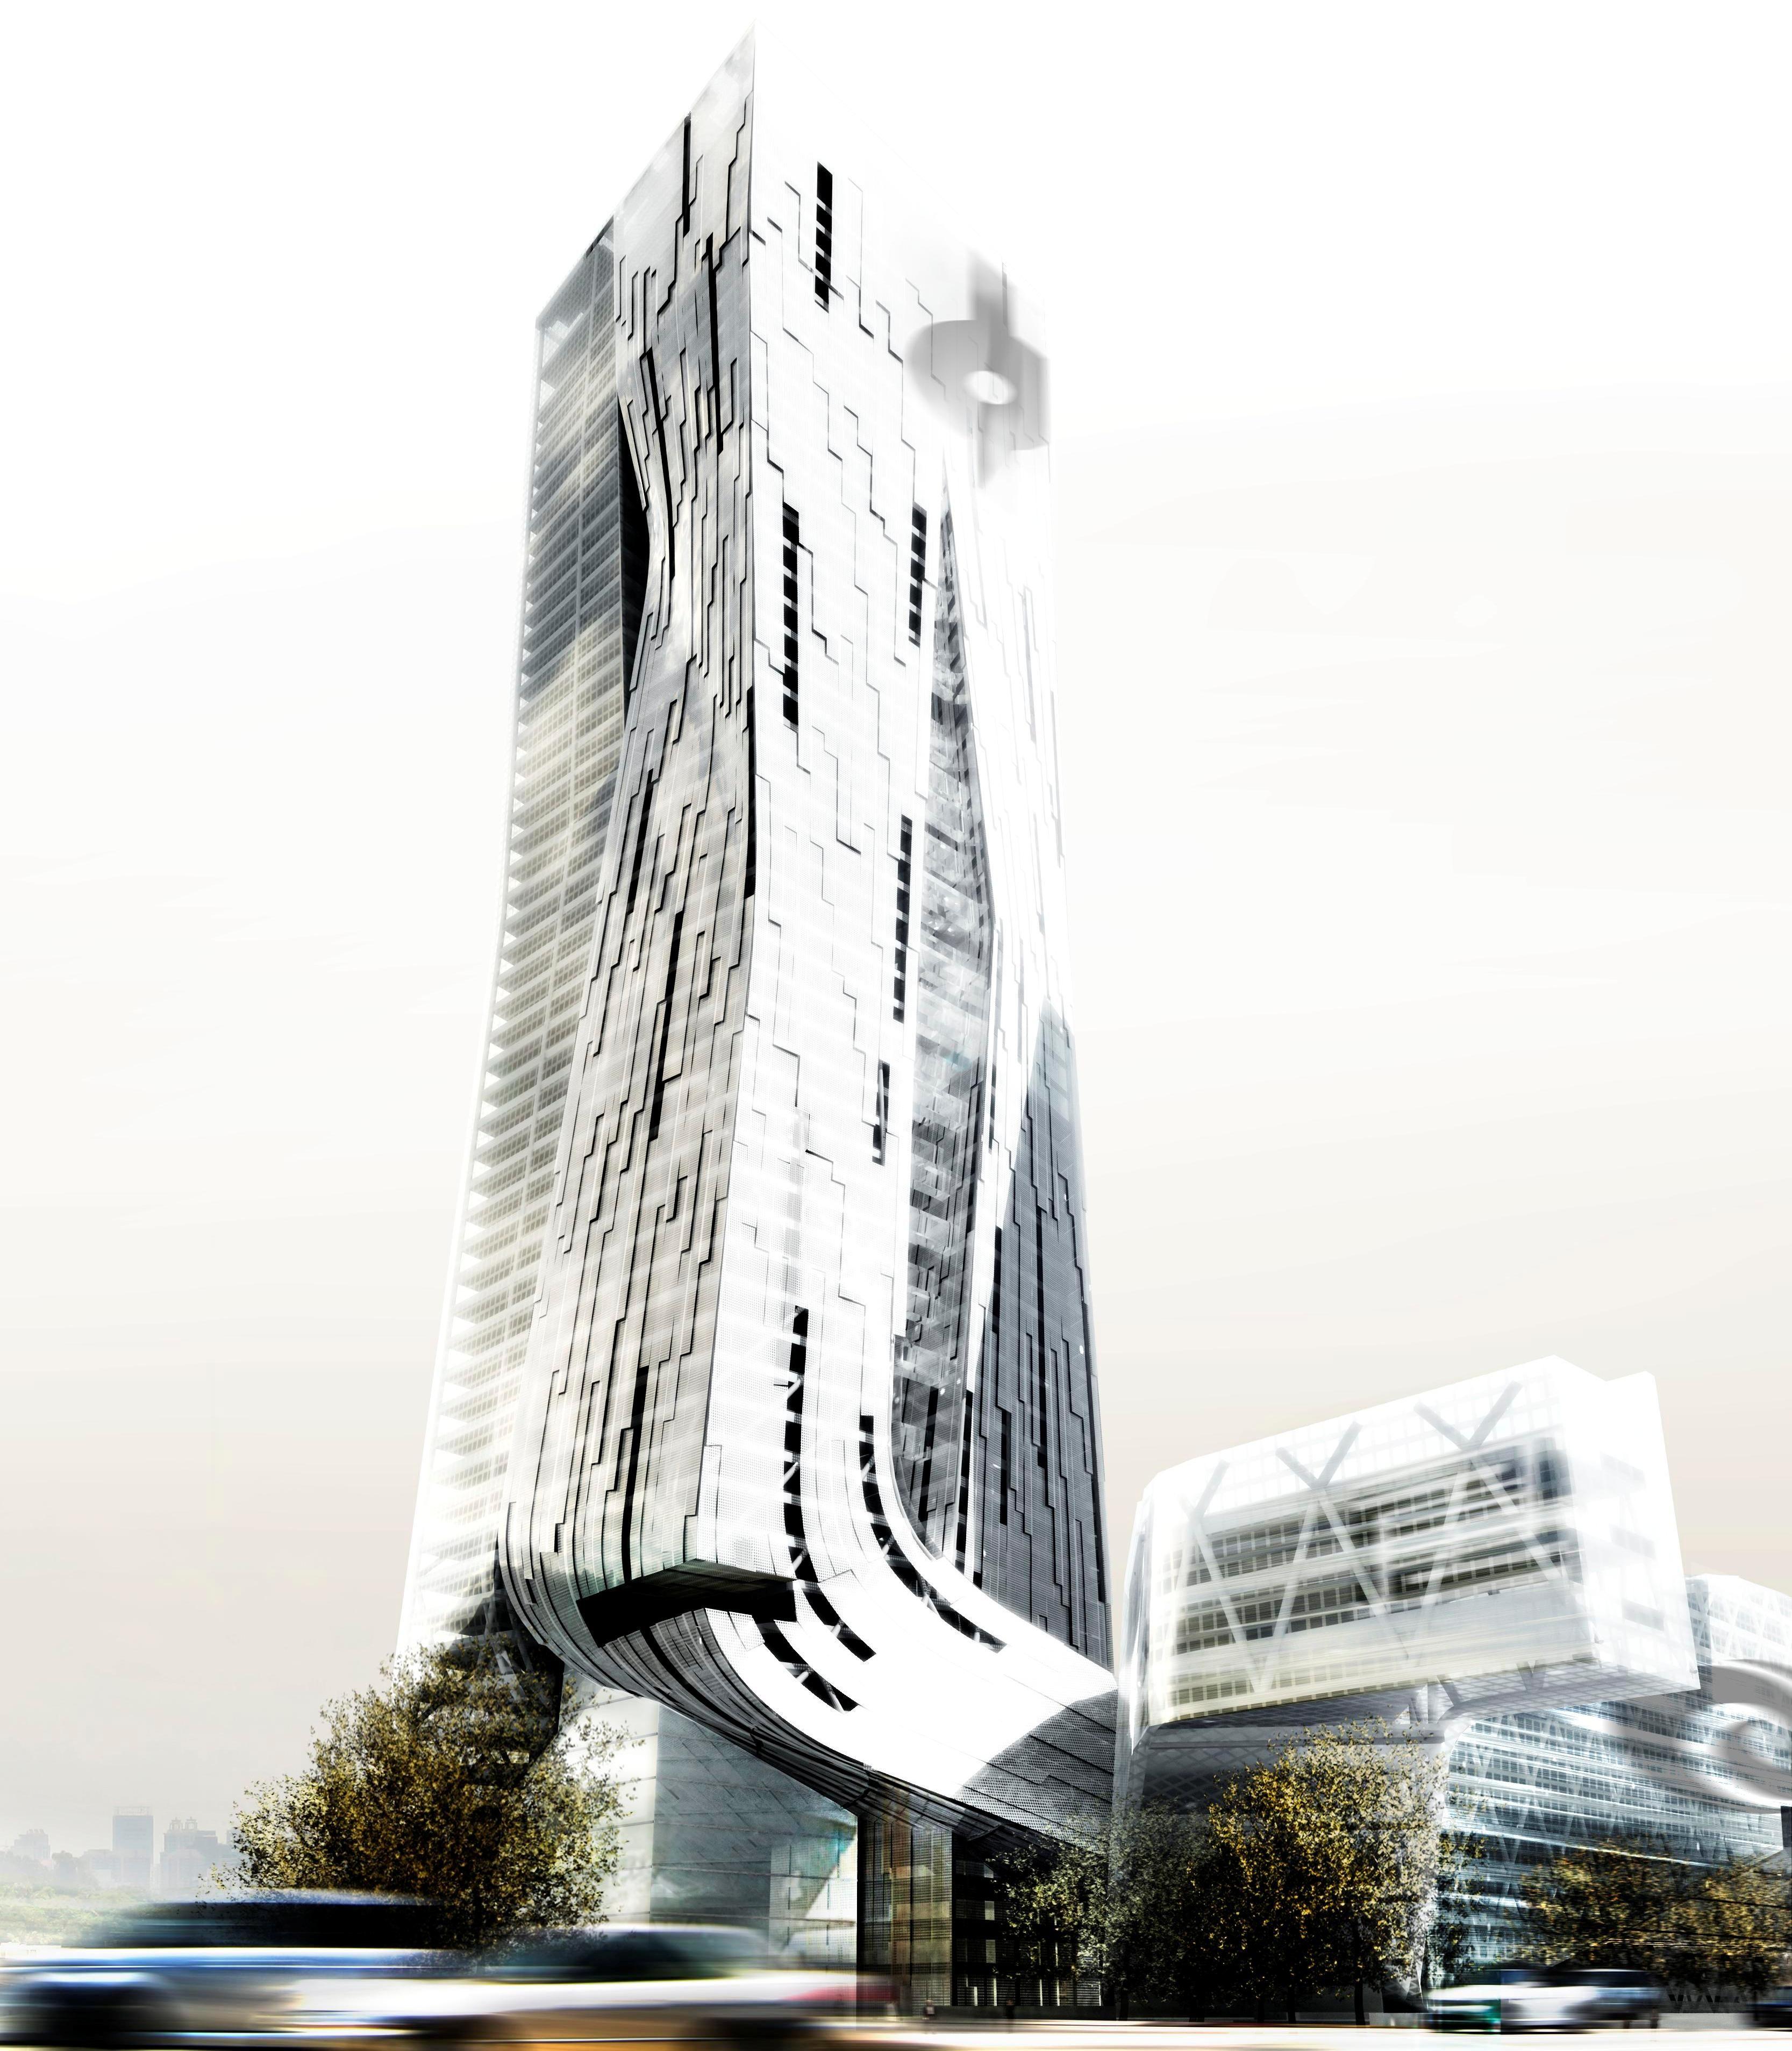 Amazing Architecture Magazine: Thom Mayne Architecture - Google Pretraživanje